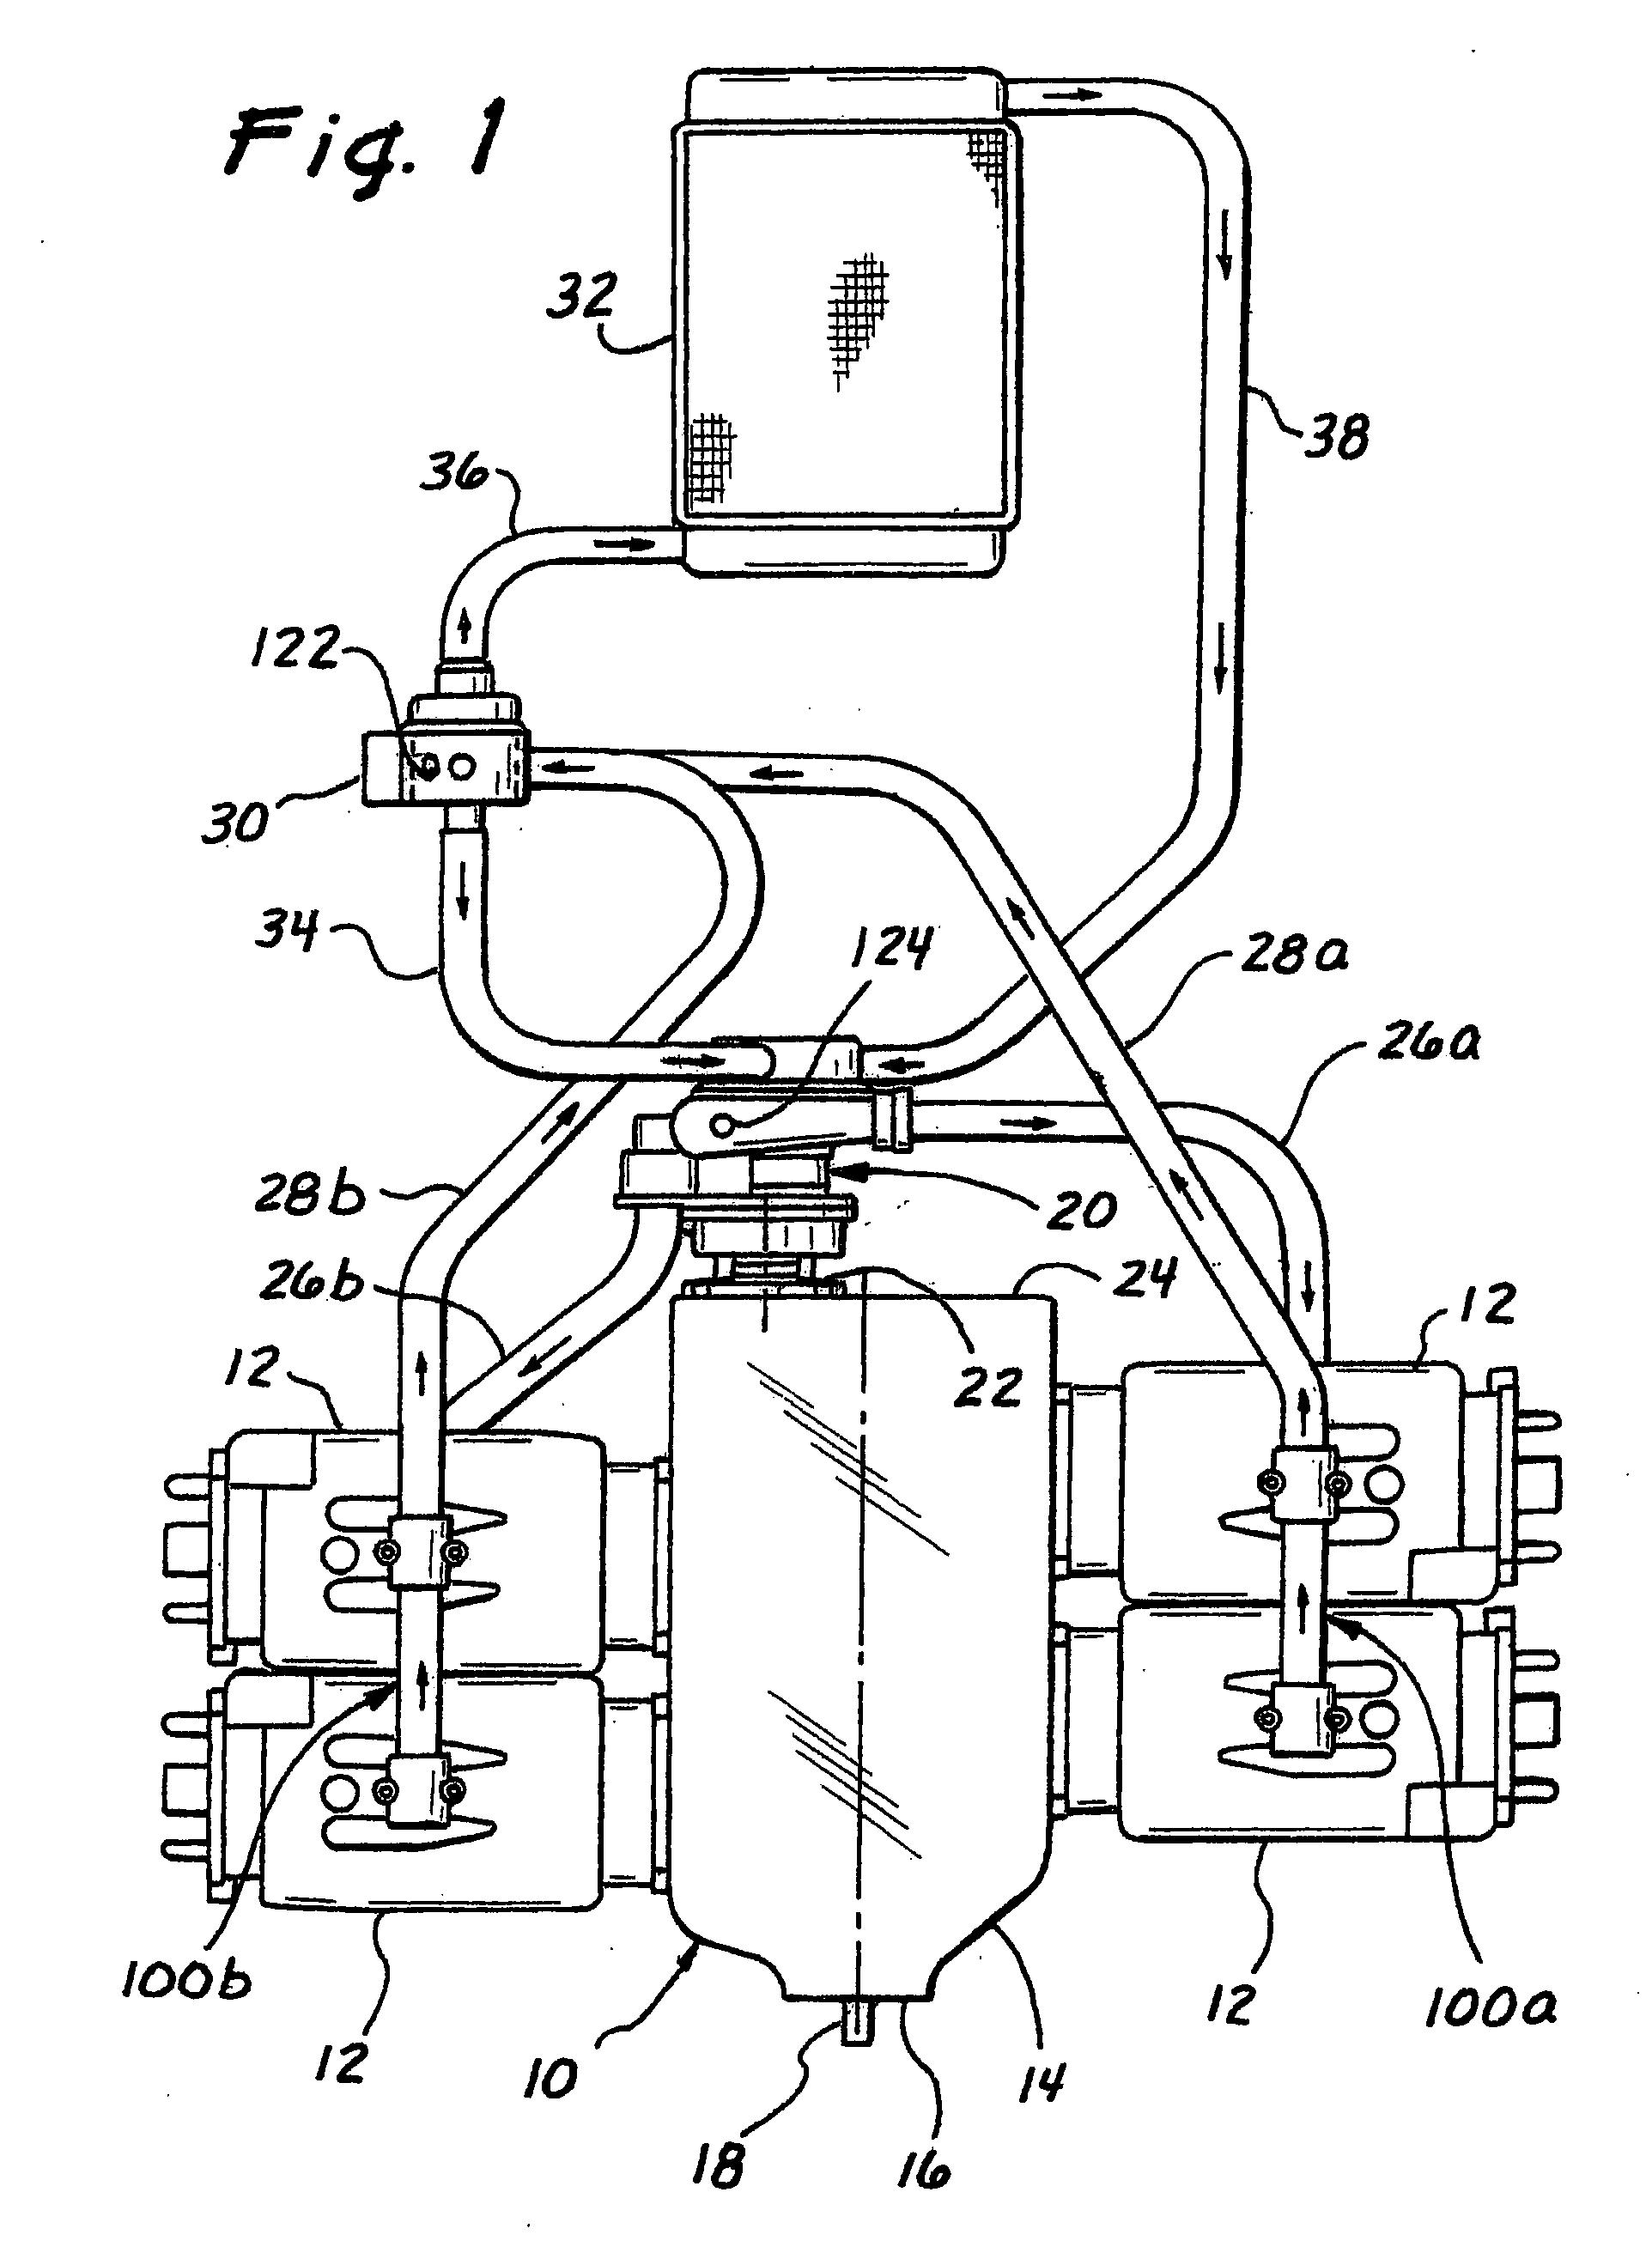 Spark Plug Wiring Diagram Io 360 Lycoming : 41 Wiring